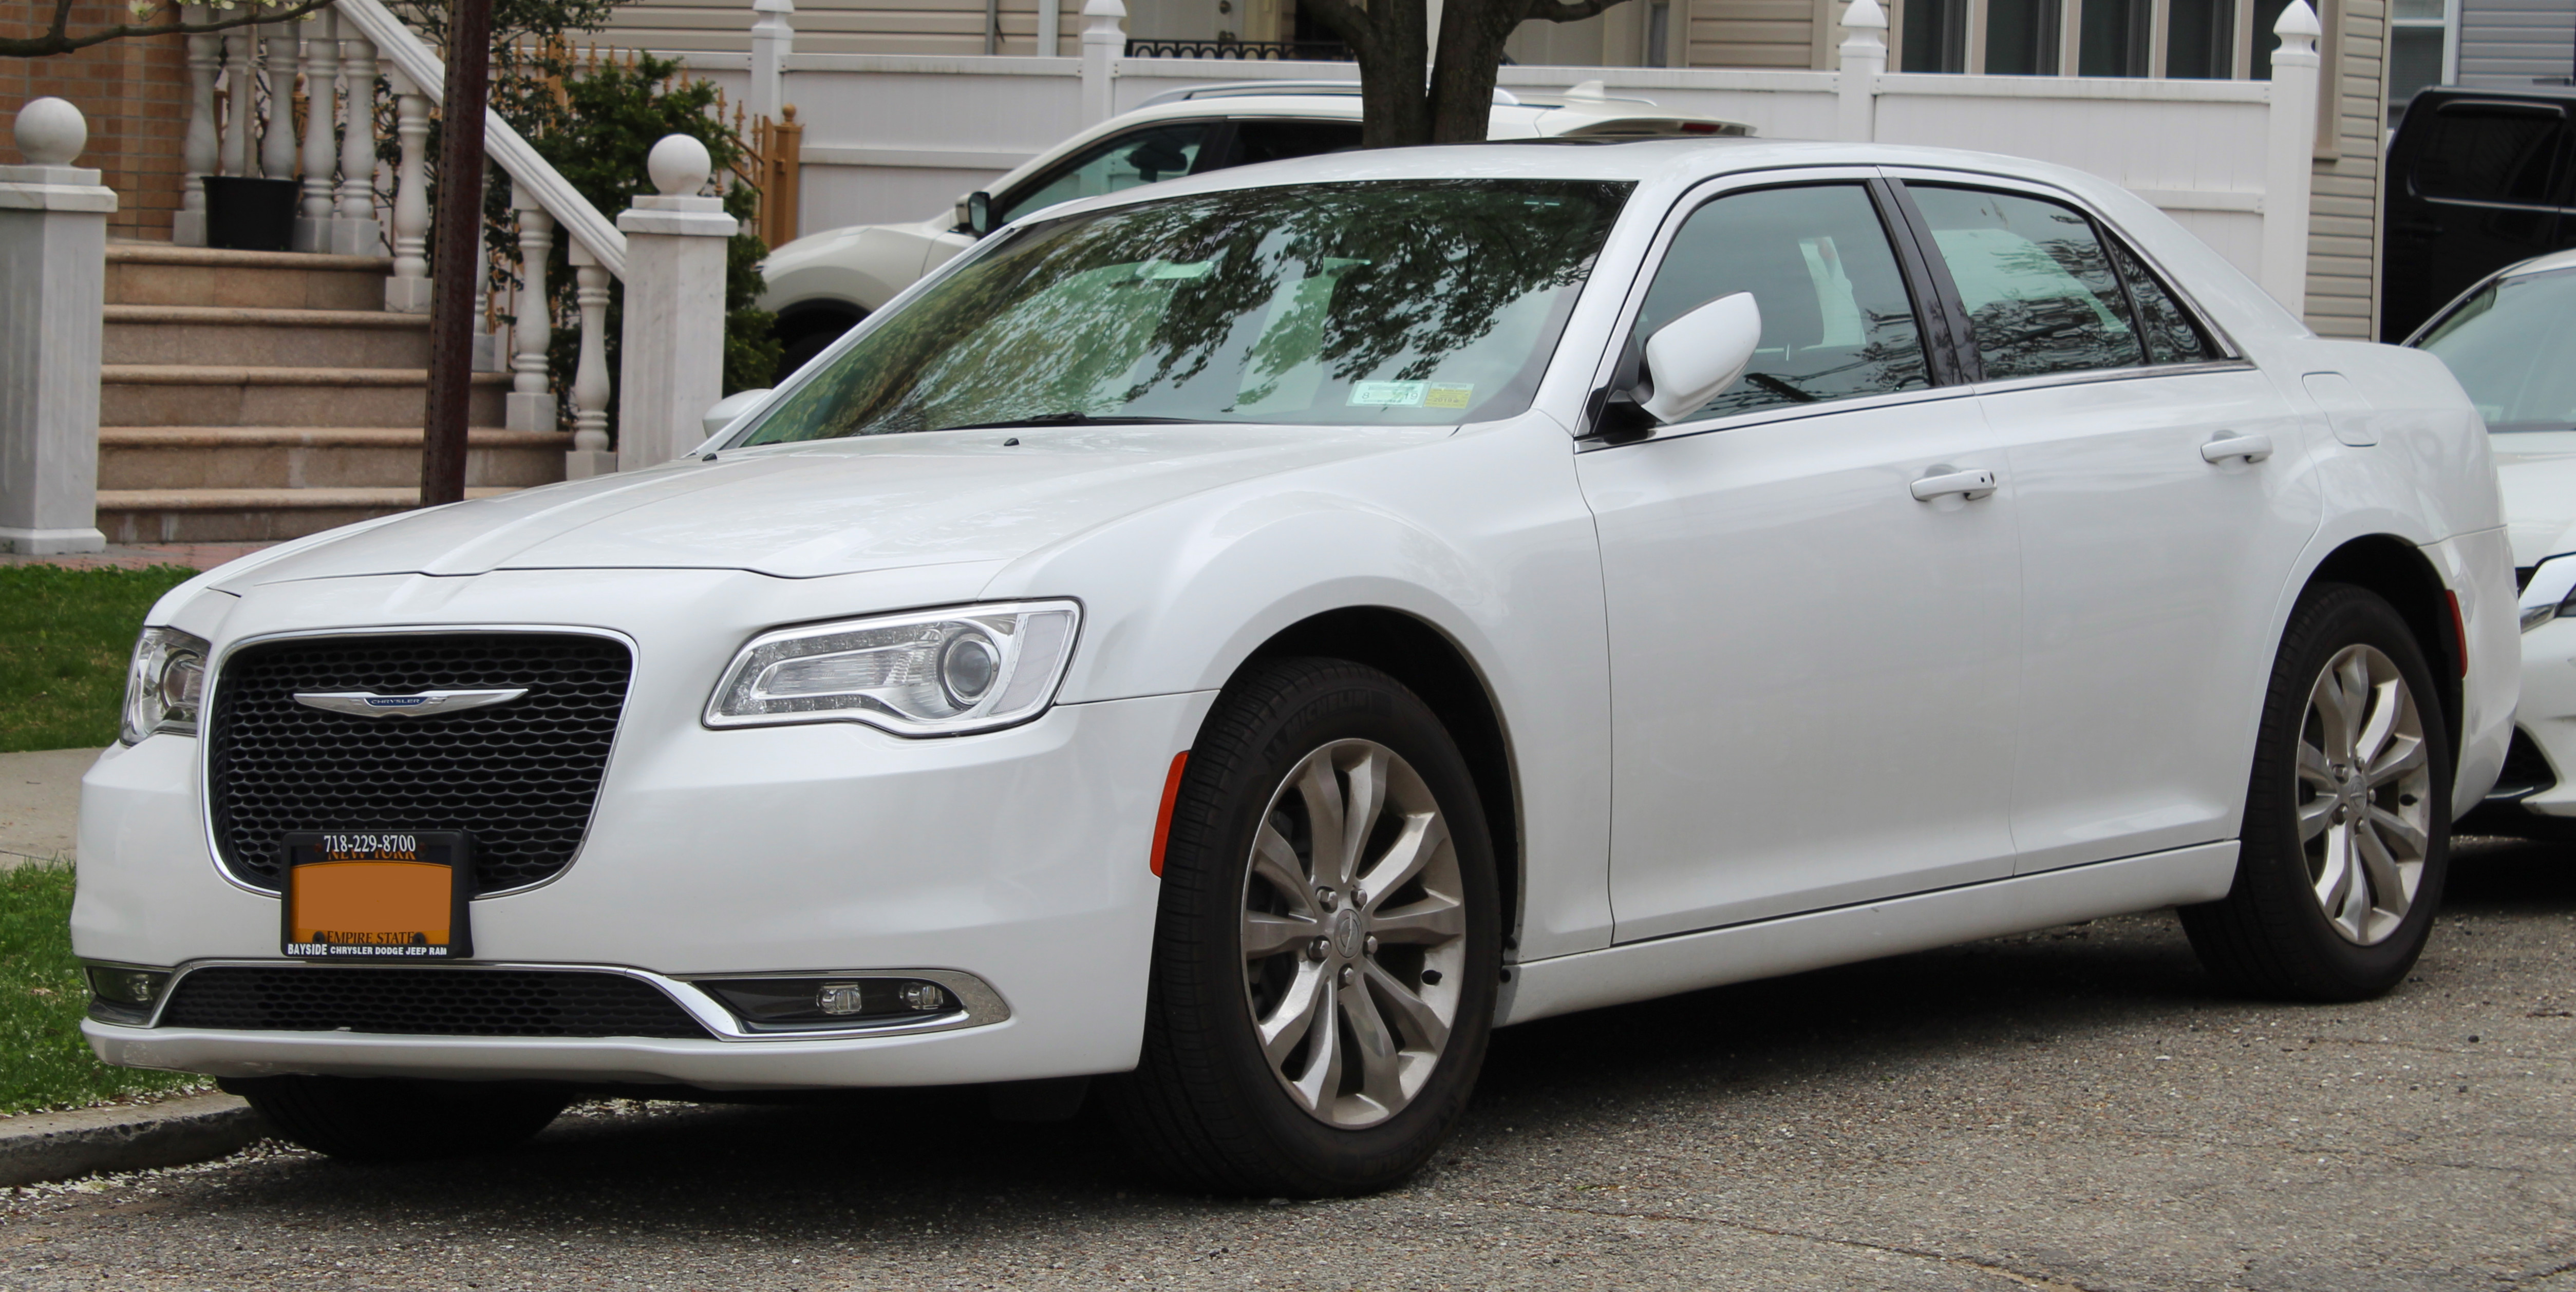 Kelebihan Kekurangan Chevrolet Chrysler Spesifikasi